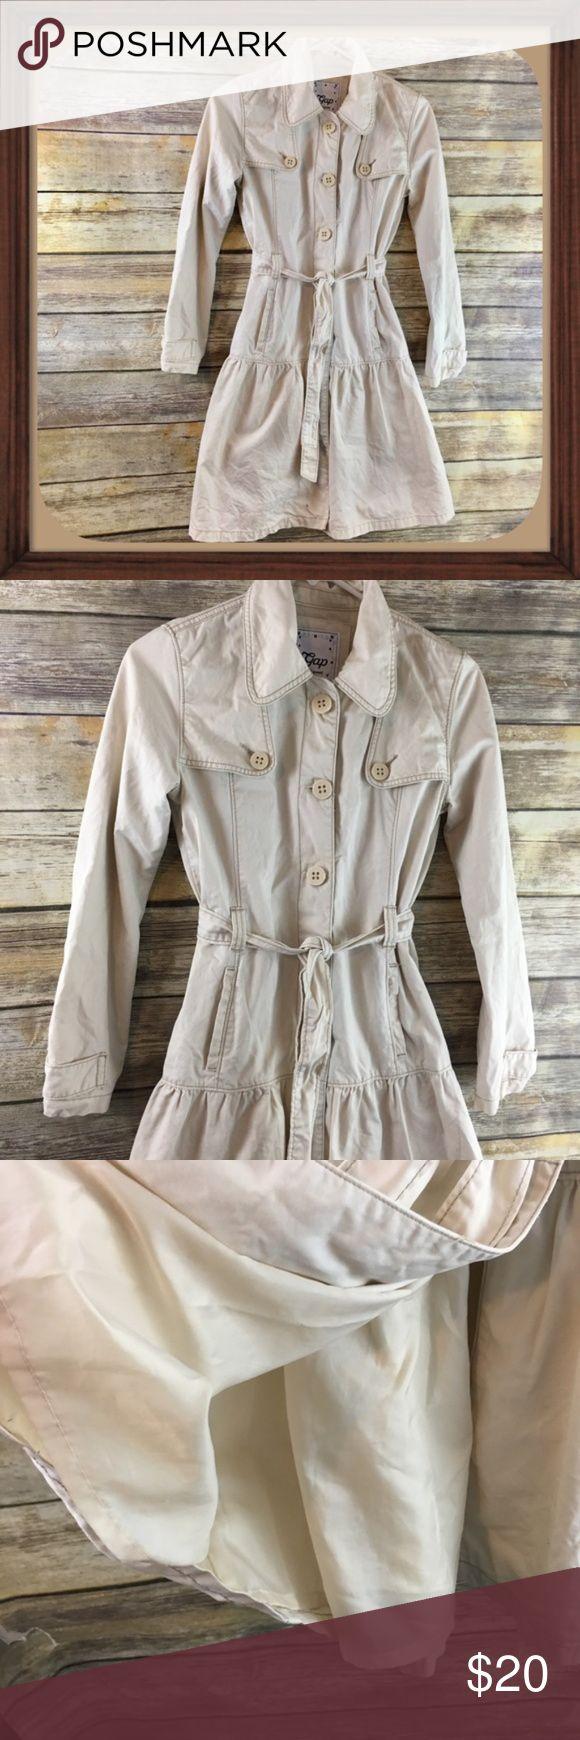 Gap Khaki Girls Trench Coat Size 12 EUC Khaki girls trench coat. Size 12. In excellent used condition. 35 inches long. 22 inch sleeves. 16 inches arm pit to arm pit. Pockets on sides. GAP Jackets & Coats